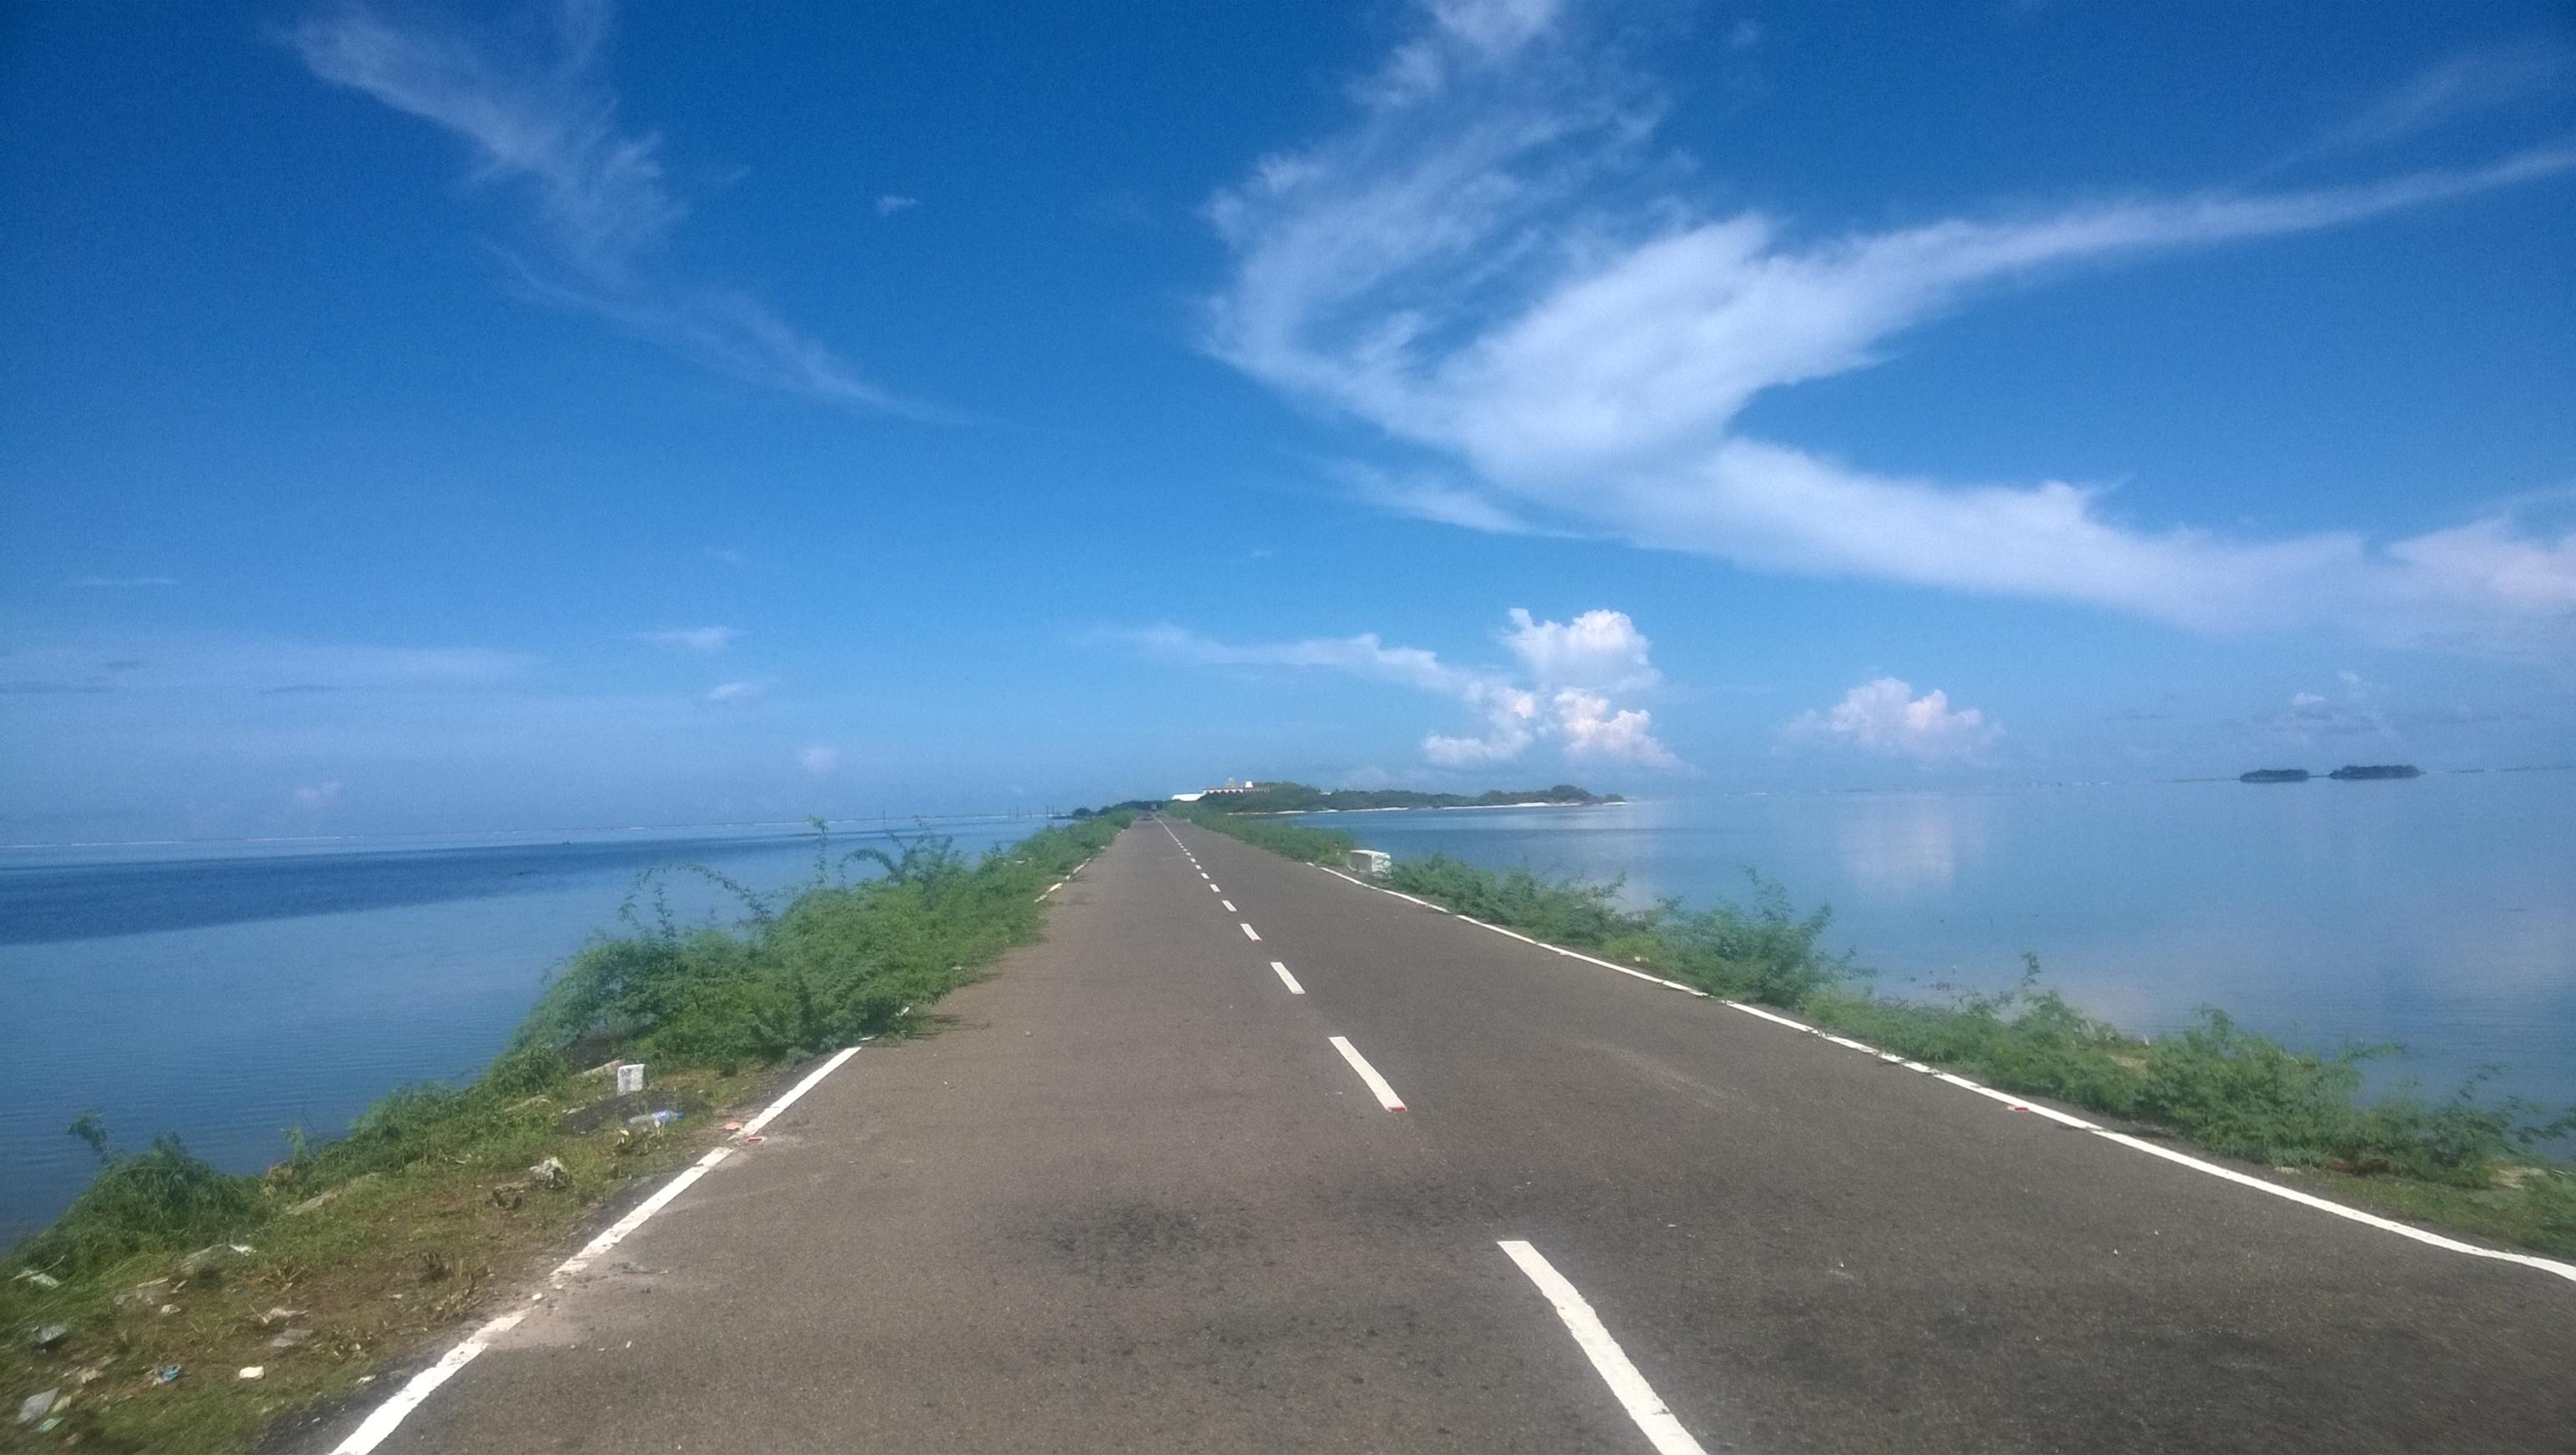 Roadtrip to Rameshwaram